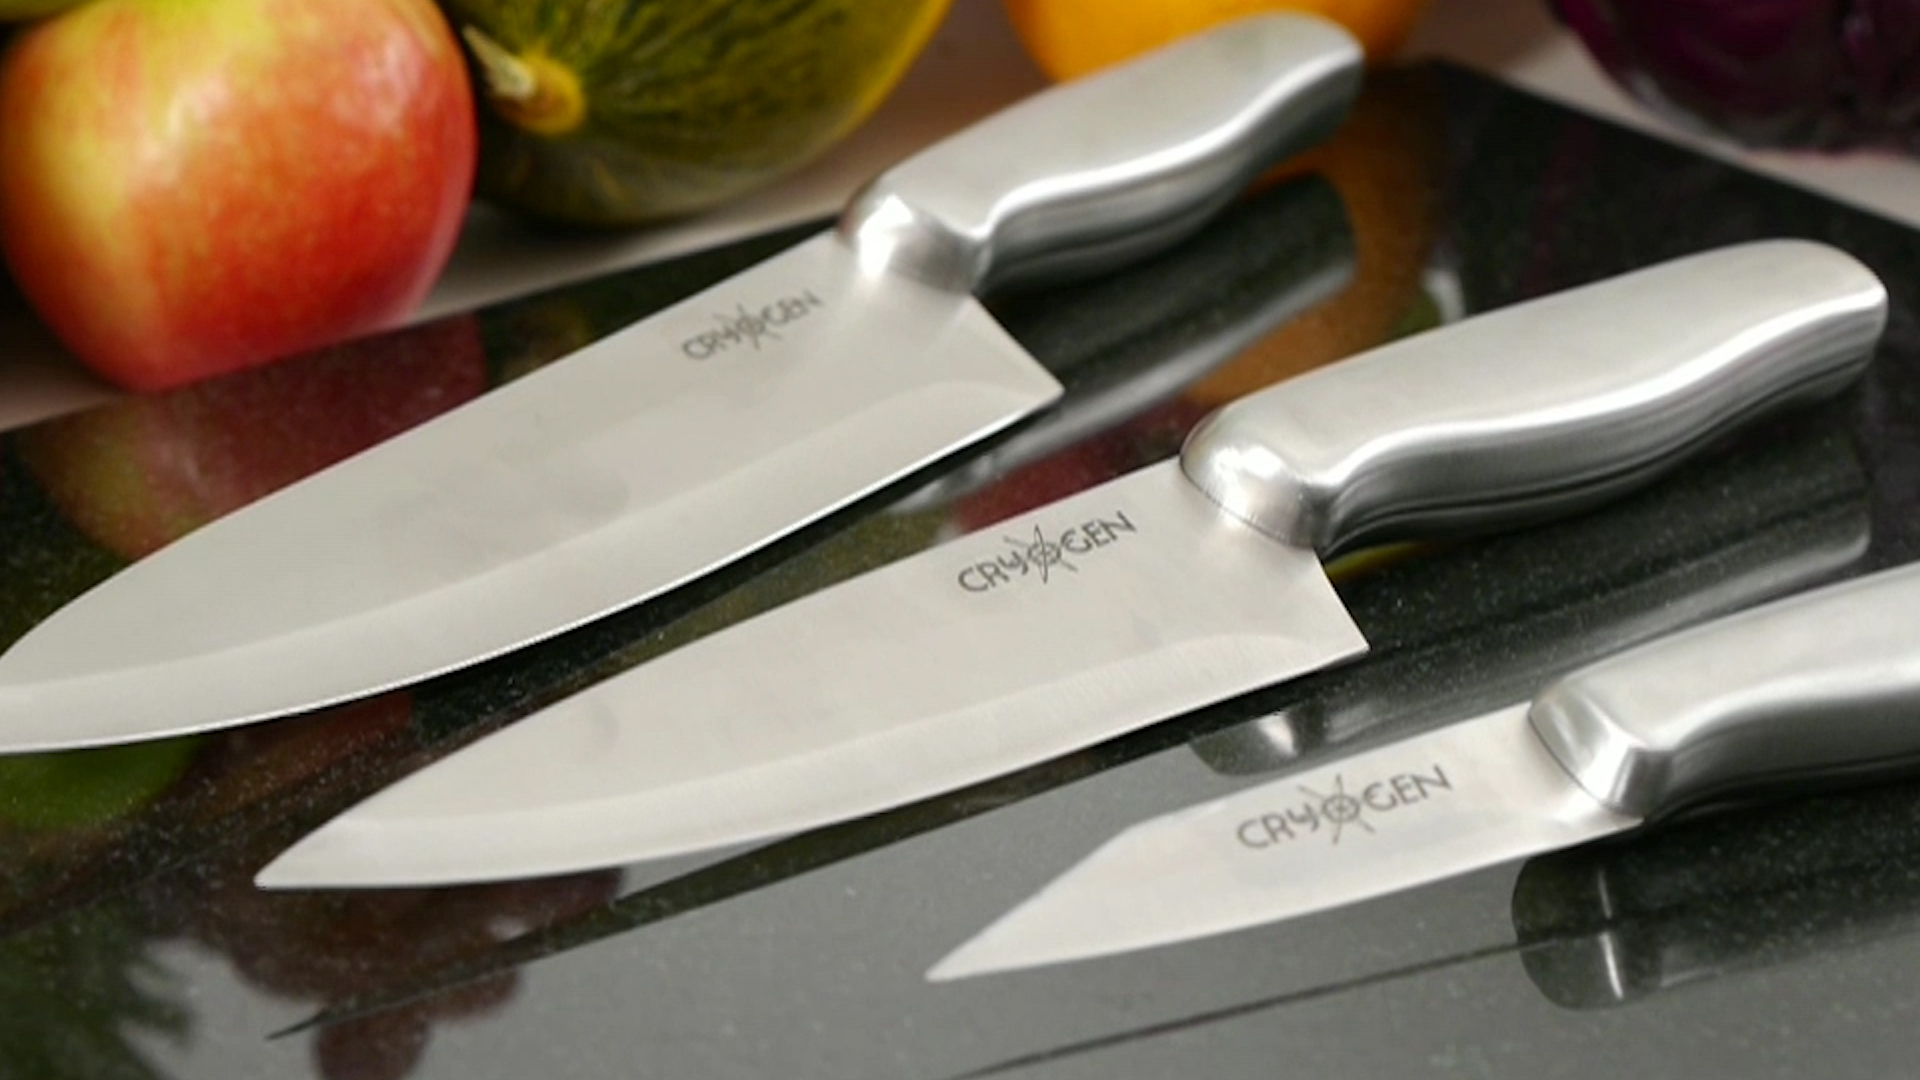 Cryogen Knives online video